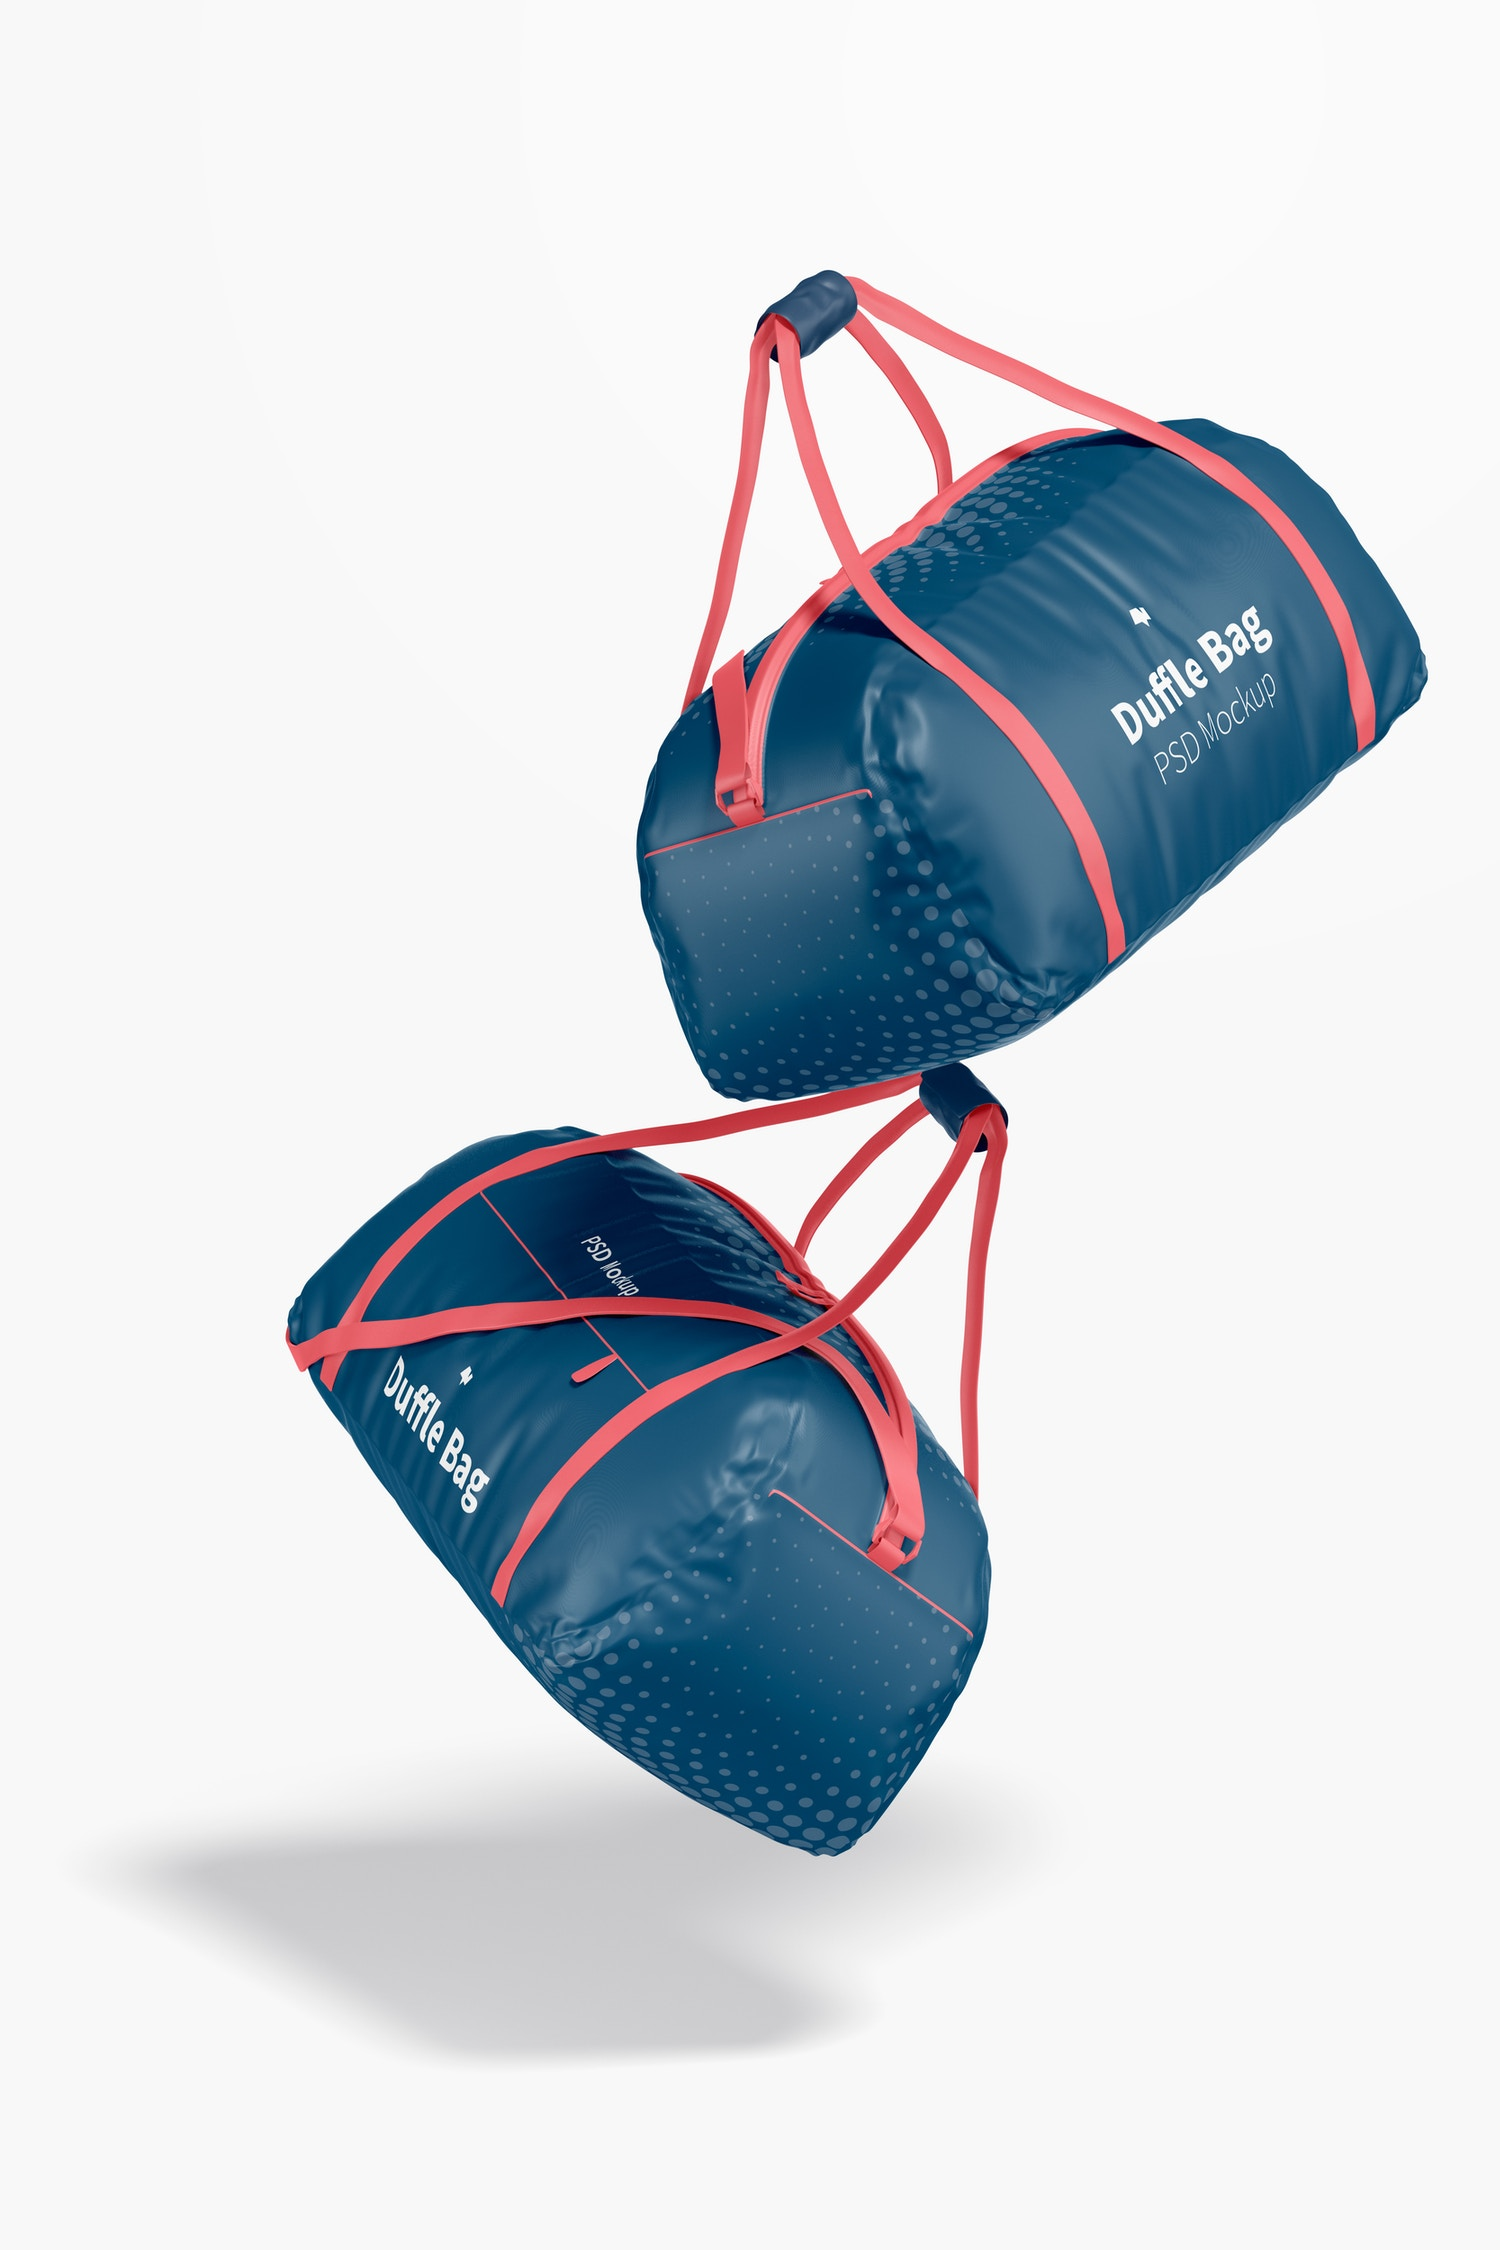 Duffle Bag Mockup, Floating